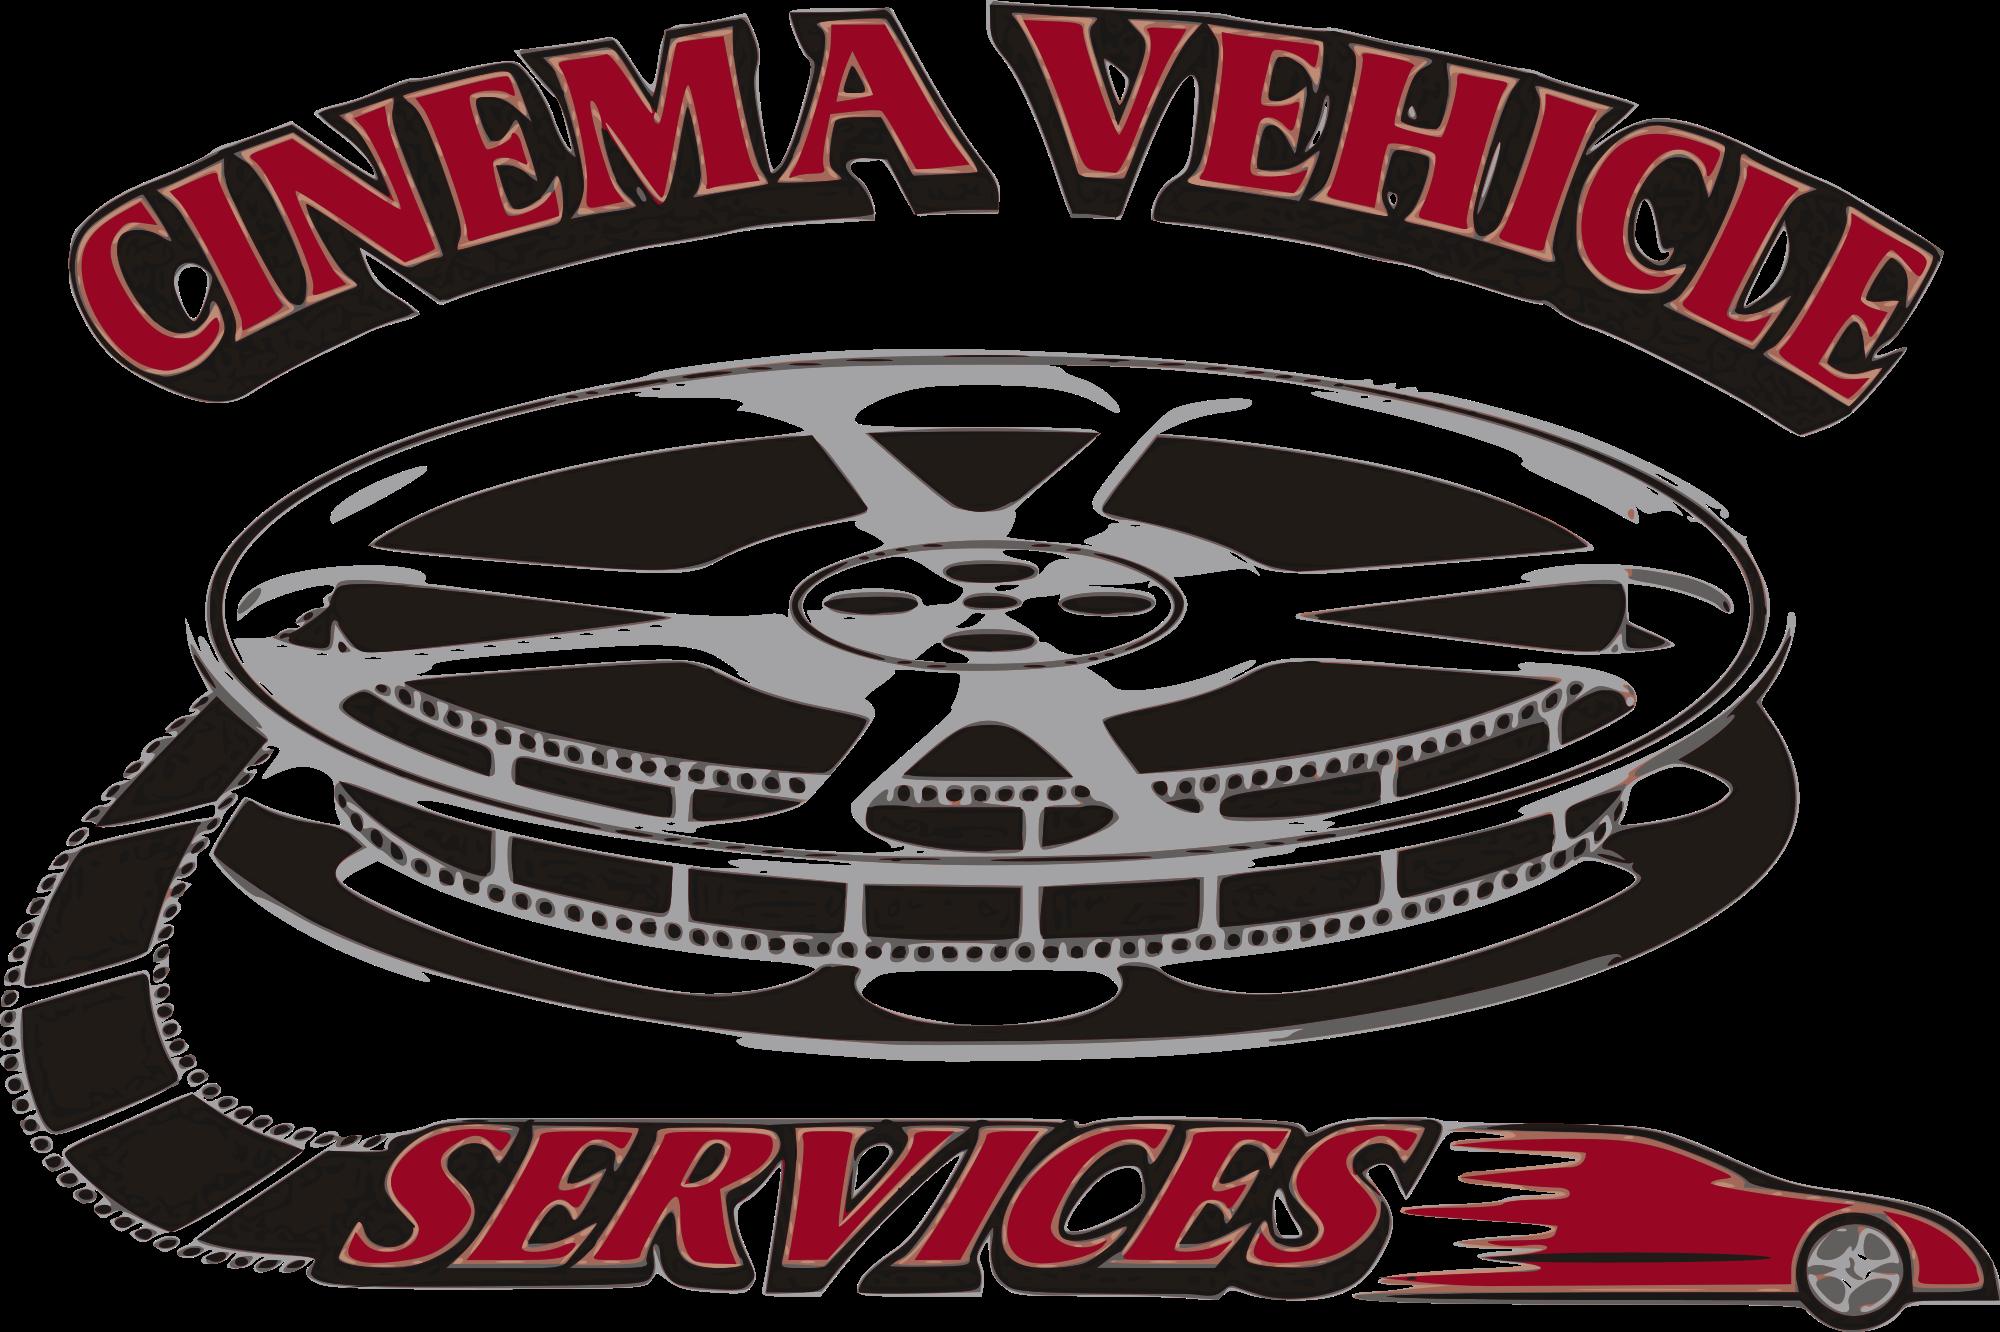 Cinema Vehicle Services